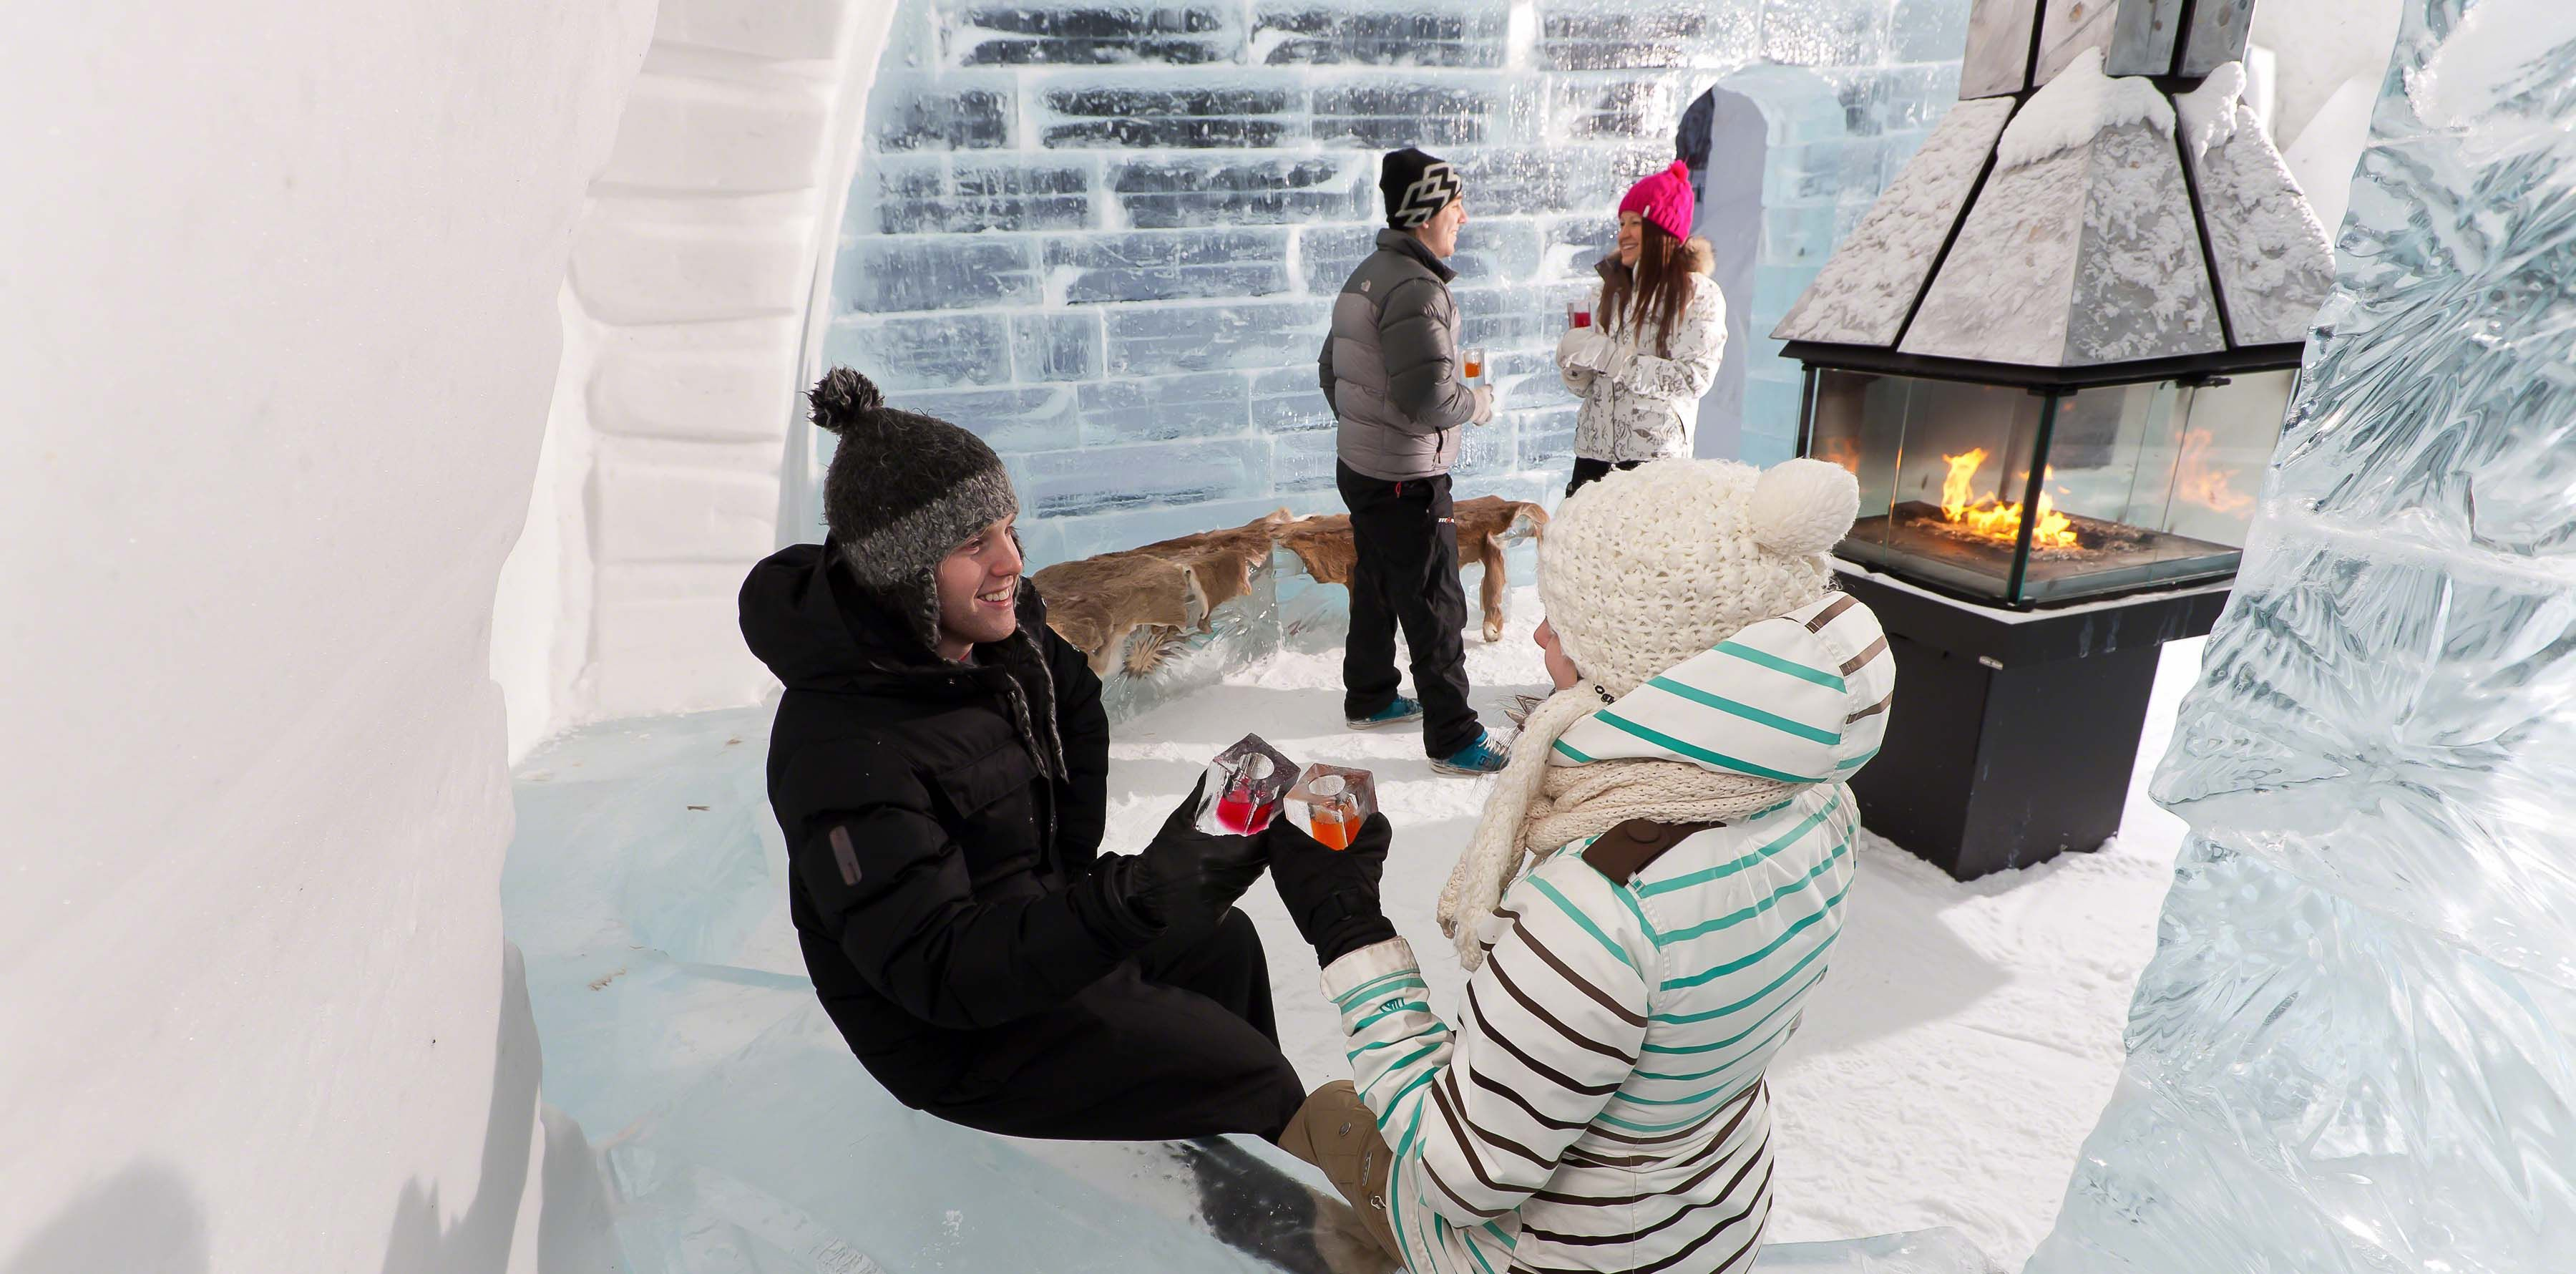 Hotel De Glace Quebec Roulez Magazine Ice Bars Summer Heat